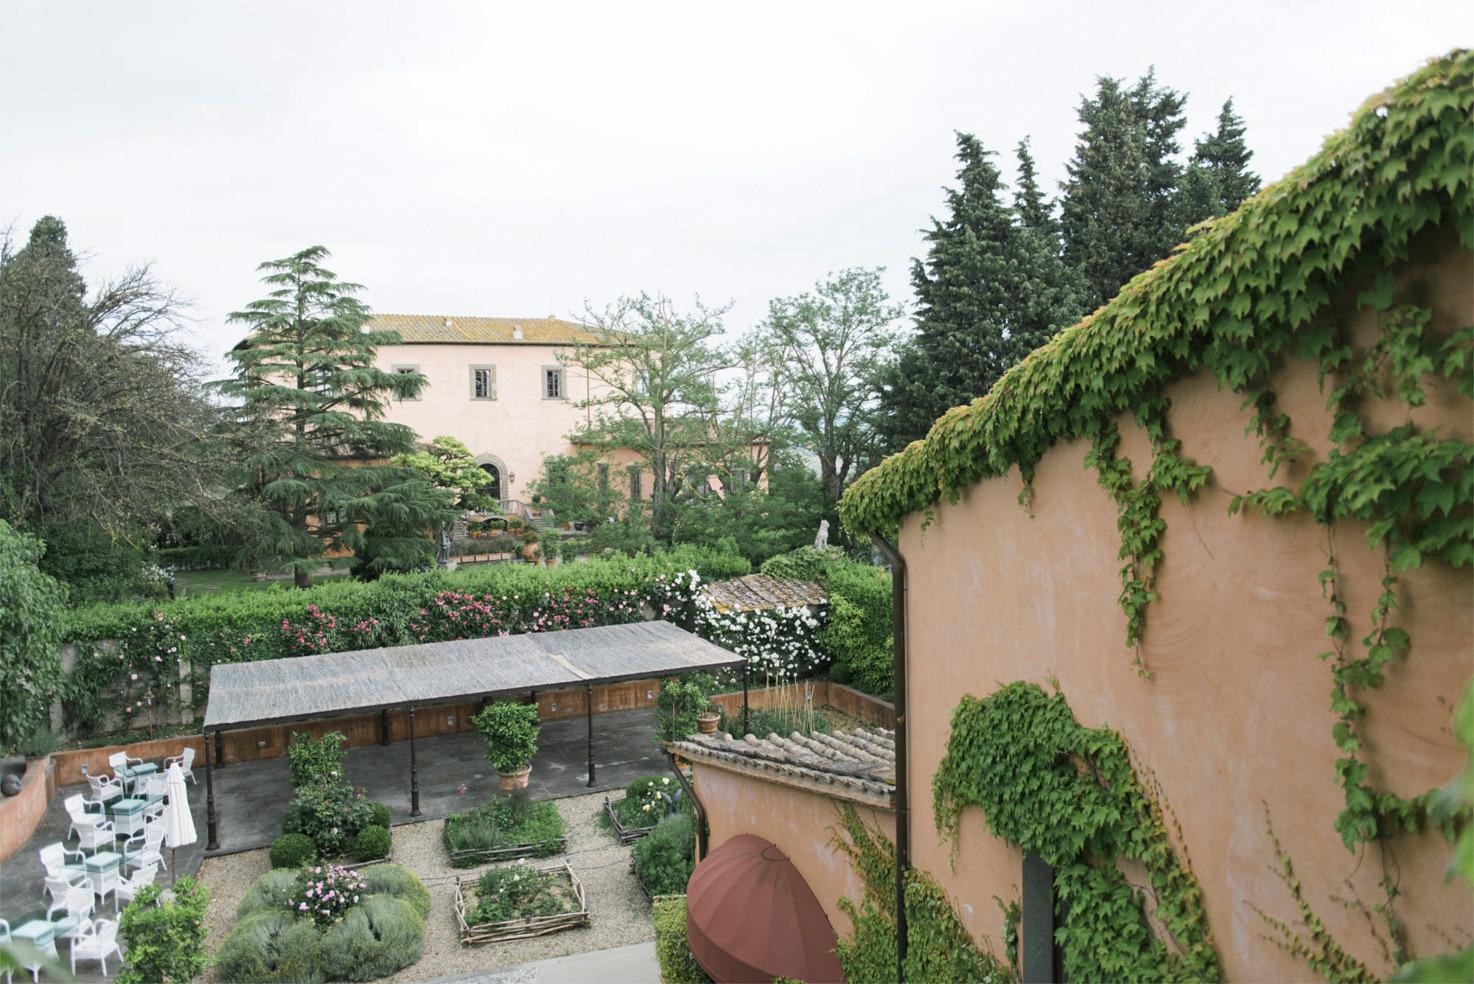 Villa Mangiacane, view from Villa Mazzei